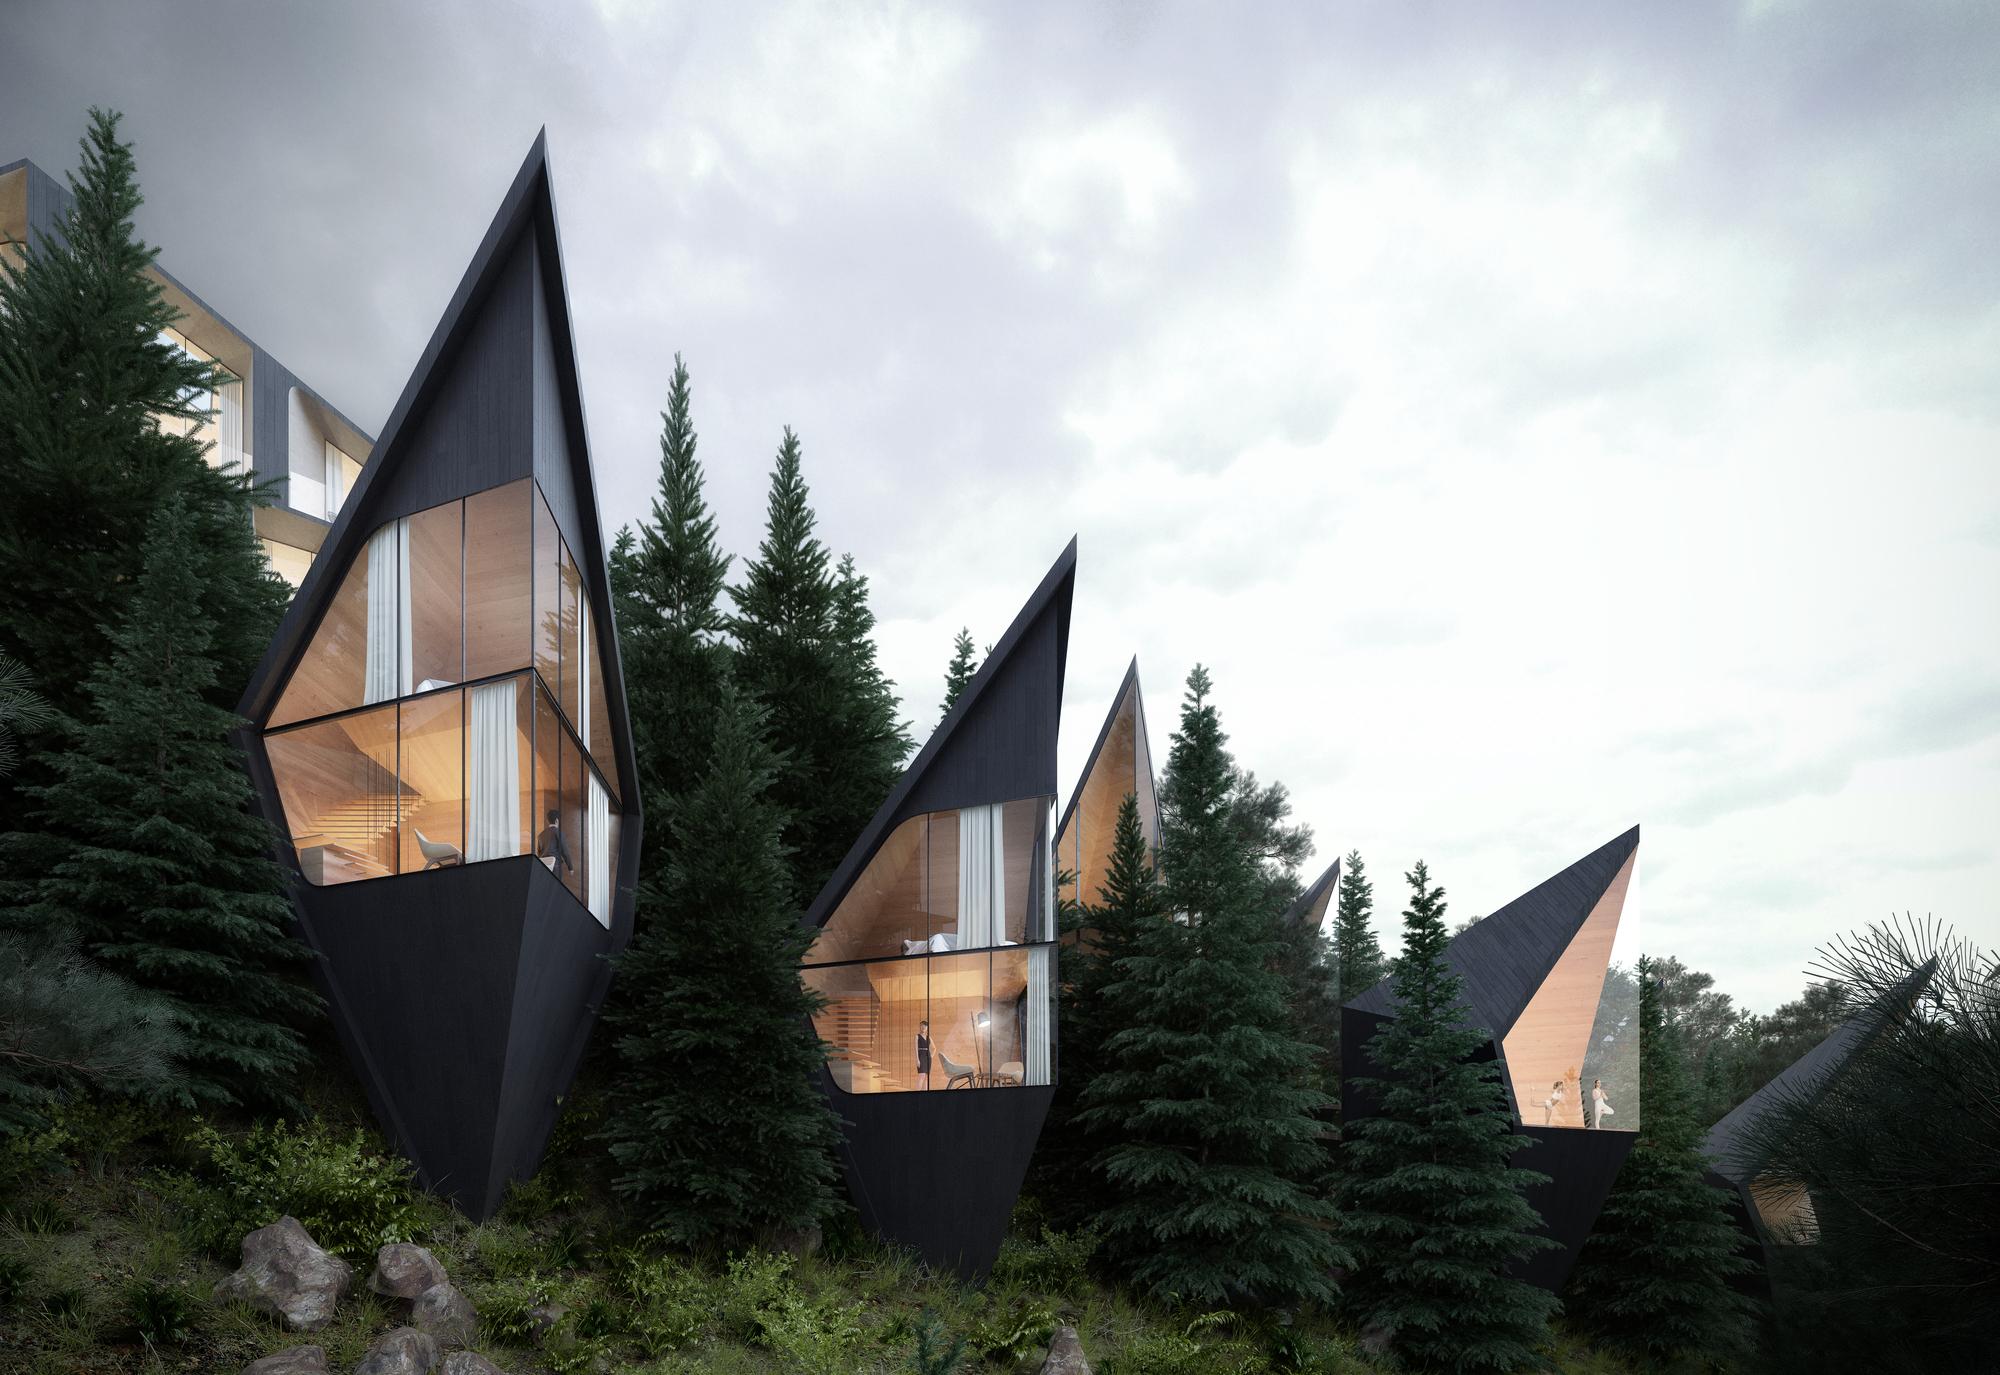 Dolomite Treehouses